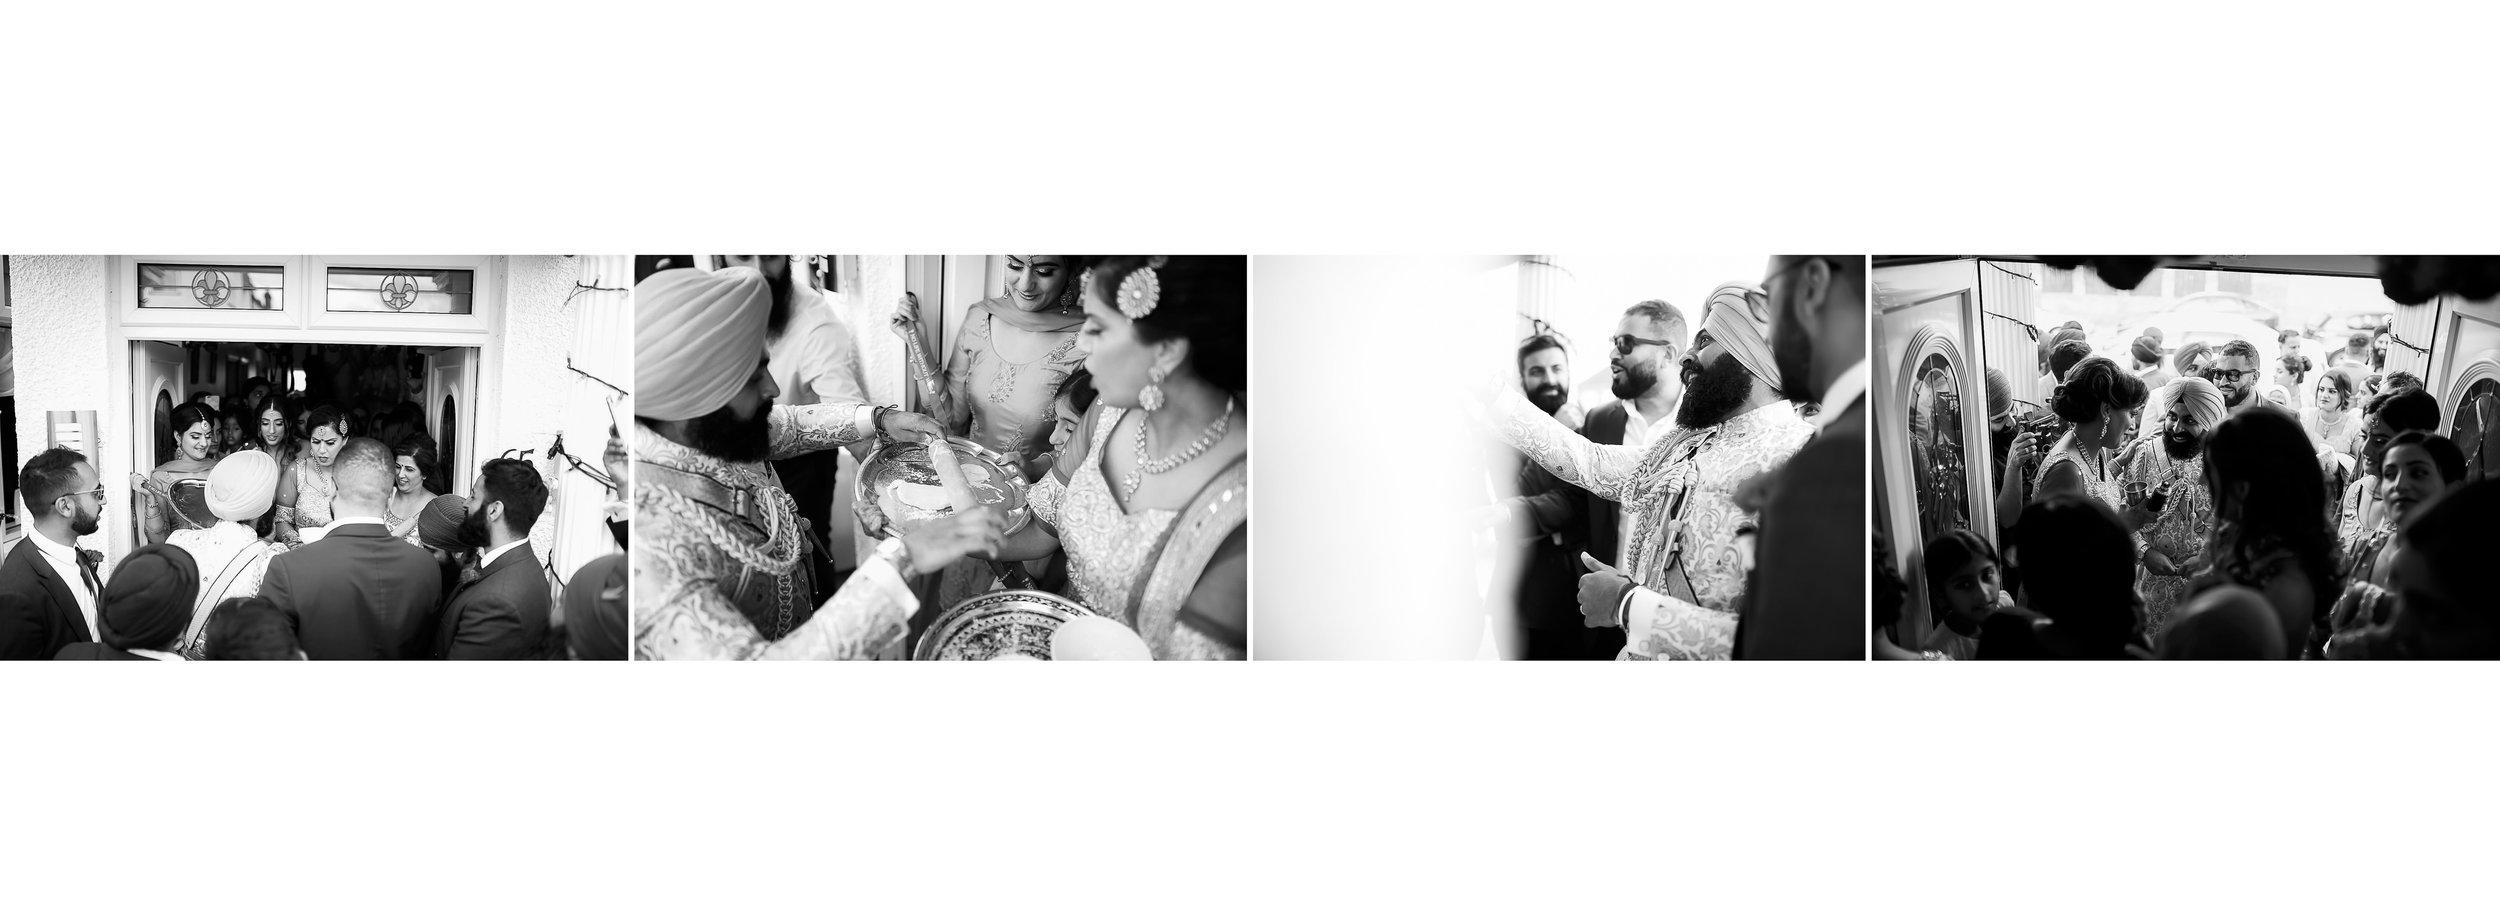 Sikh Wedding - Jaspreet and Indy-39.jpg